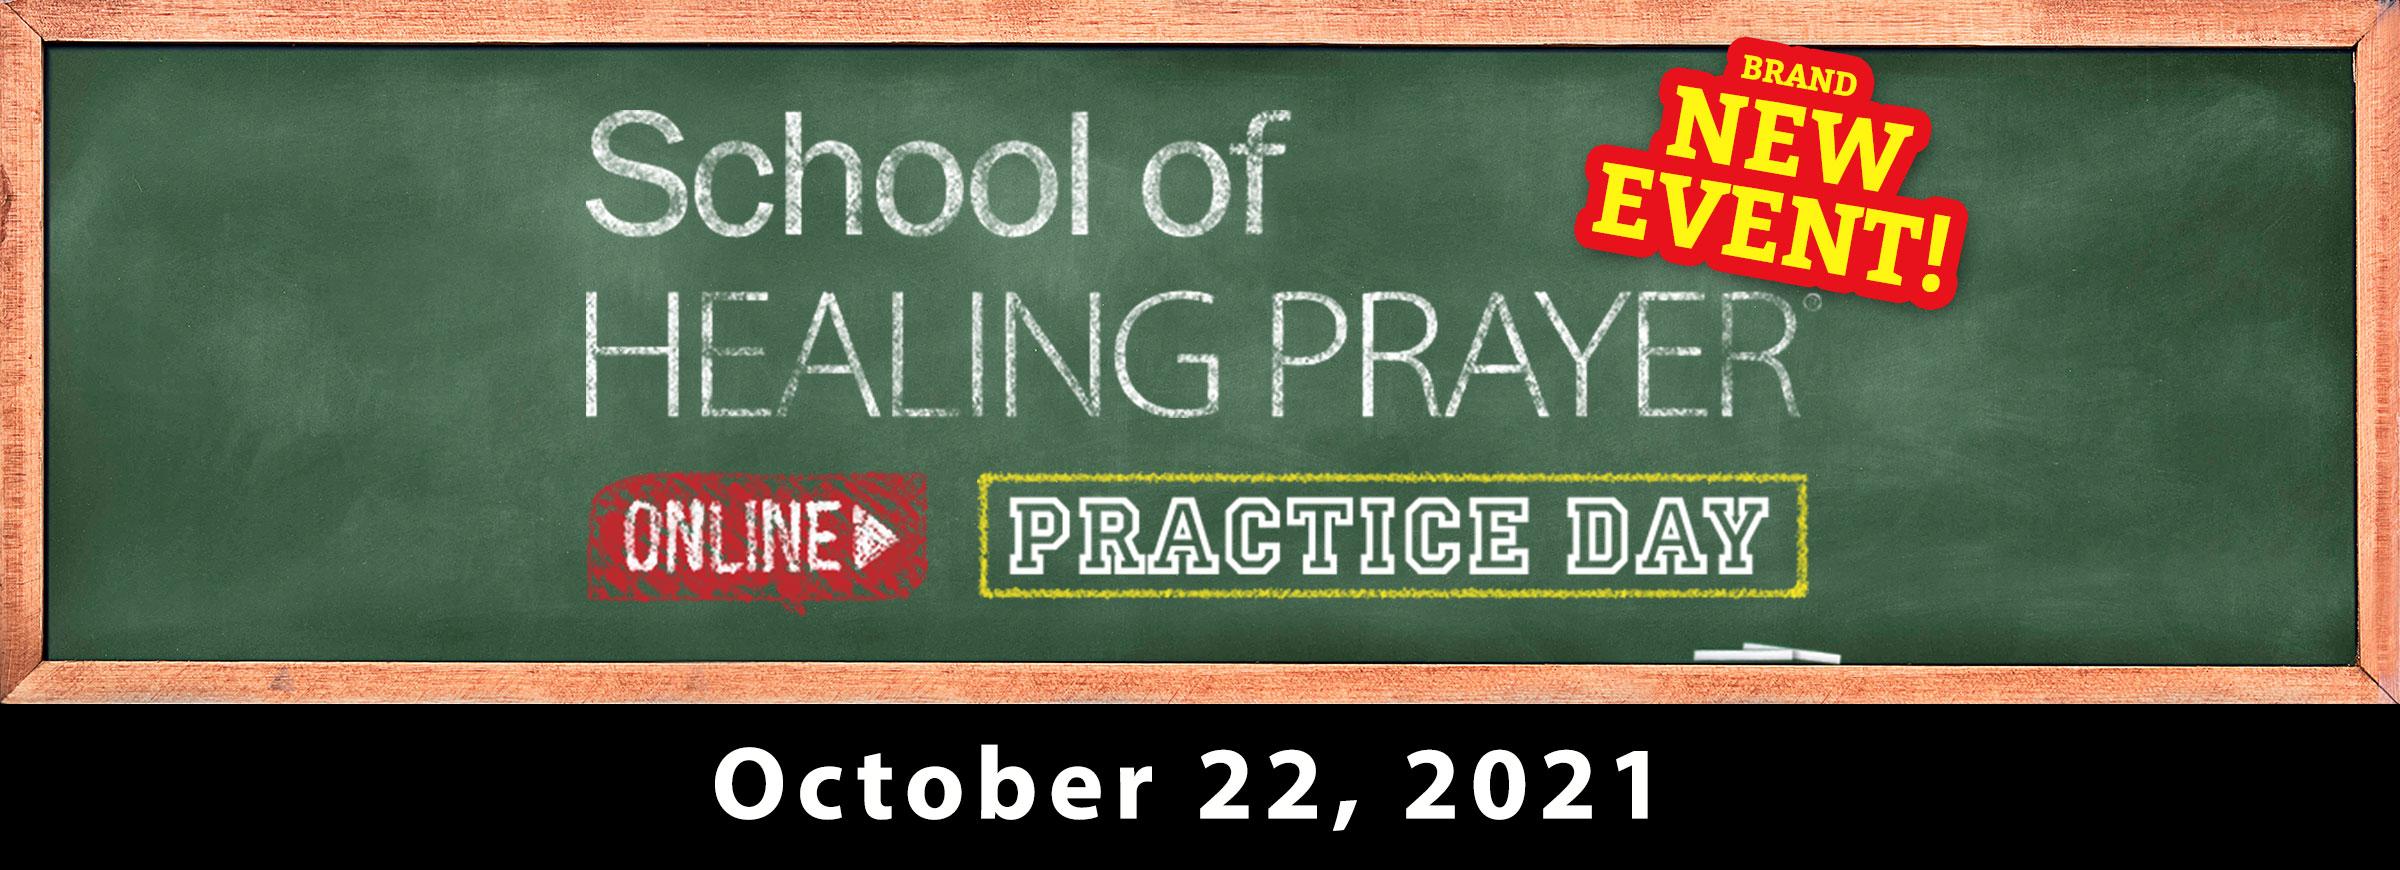 SHP Practice Day Online Oct 2021